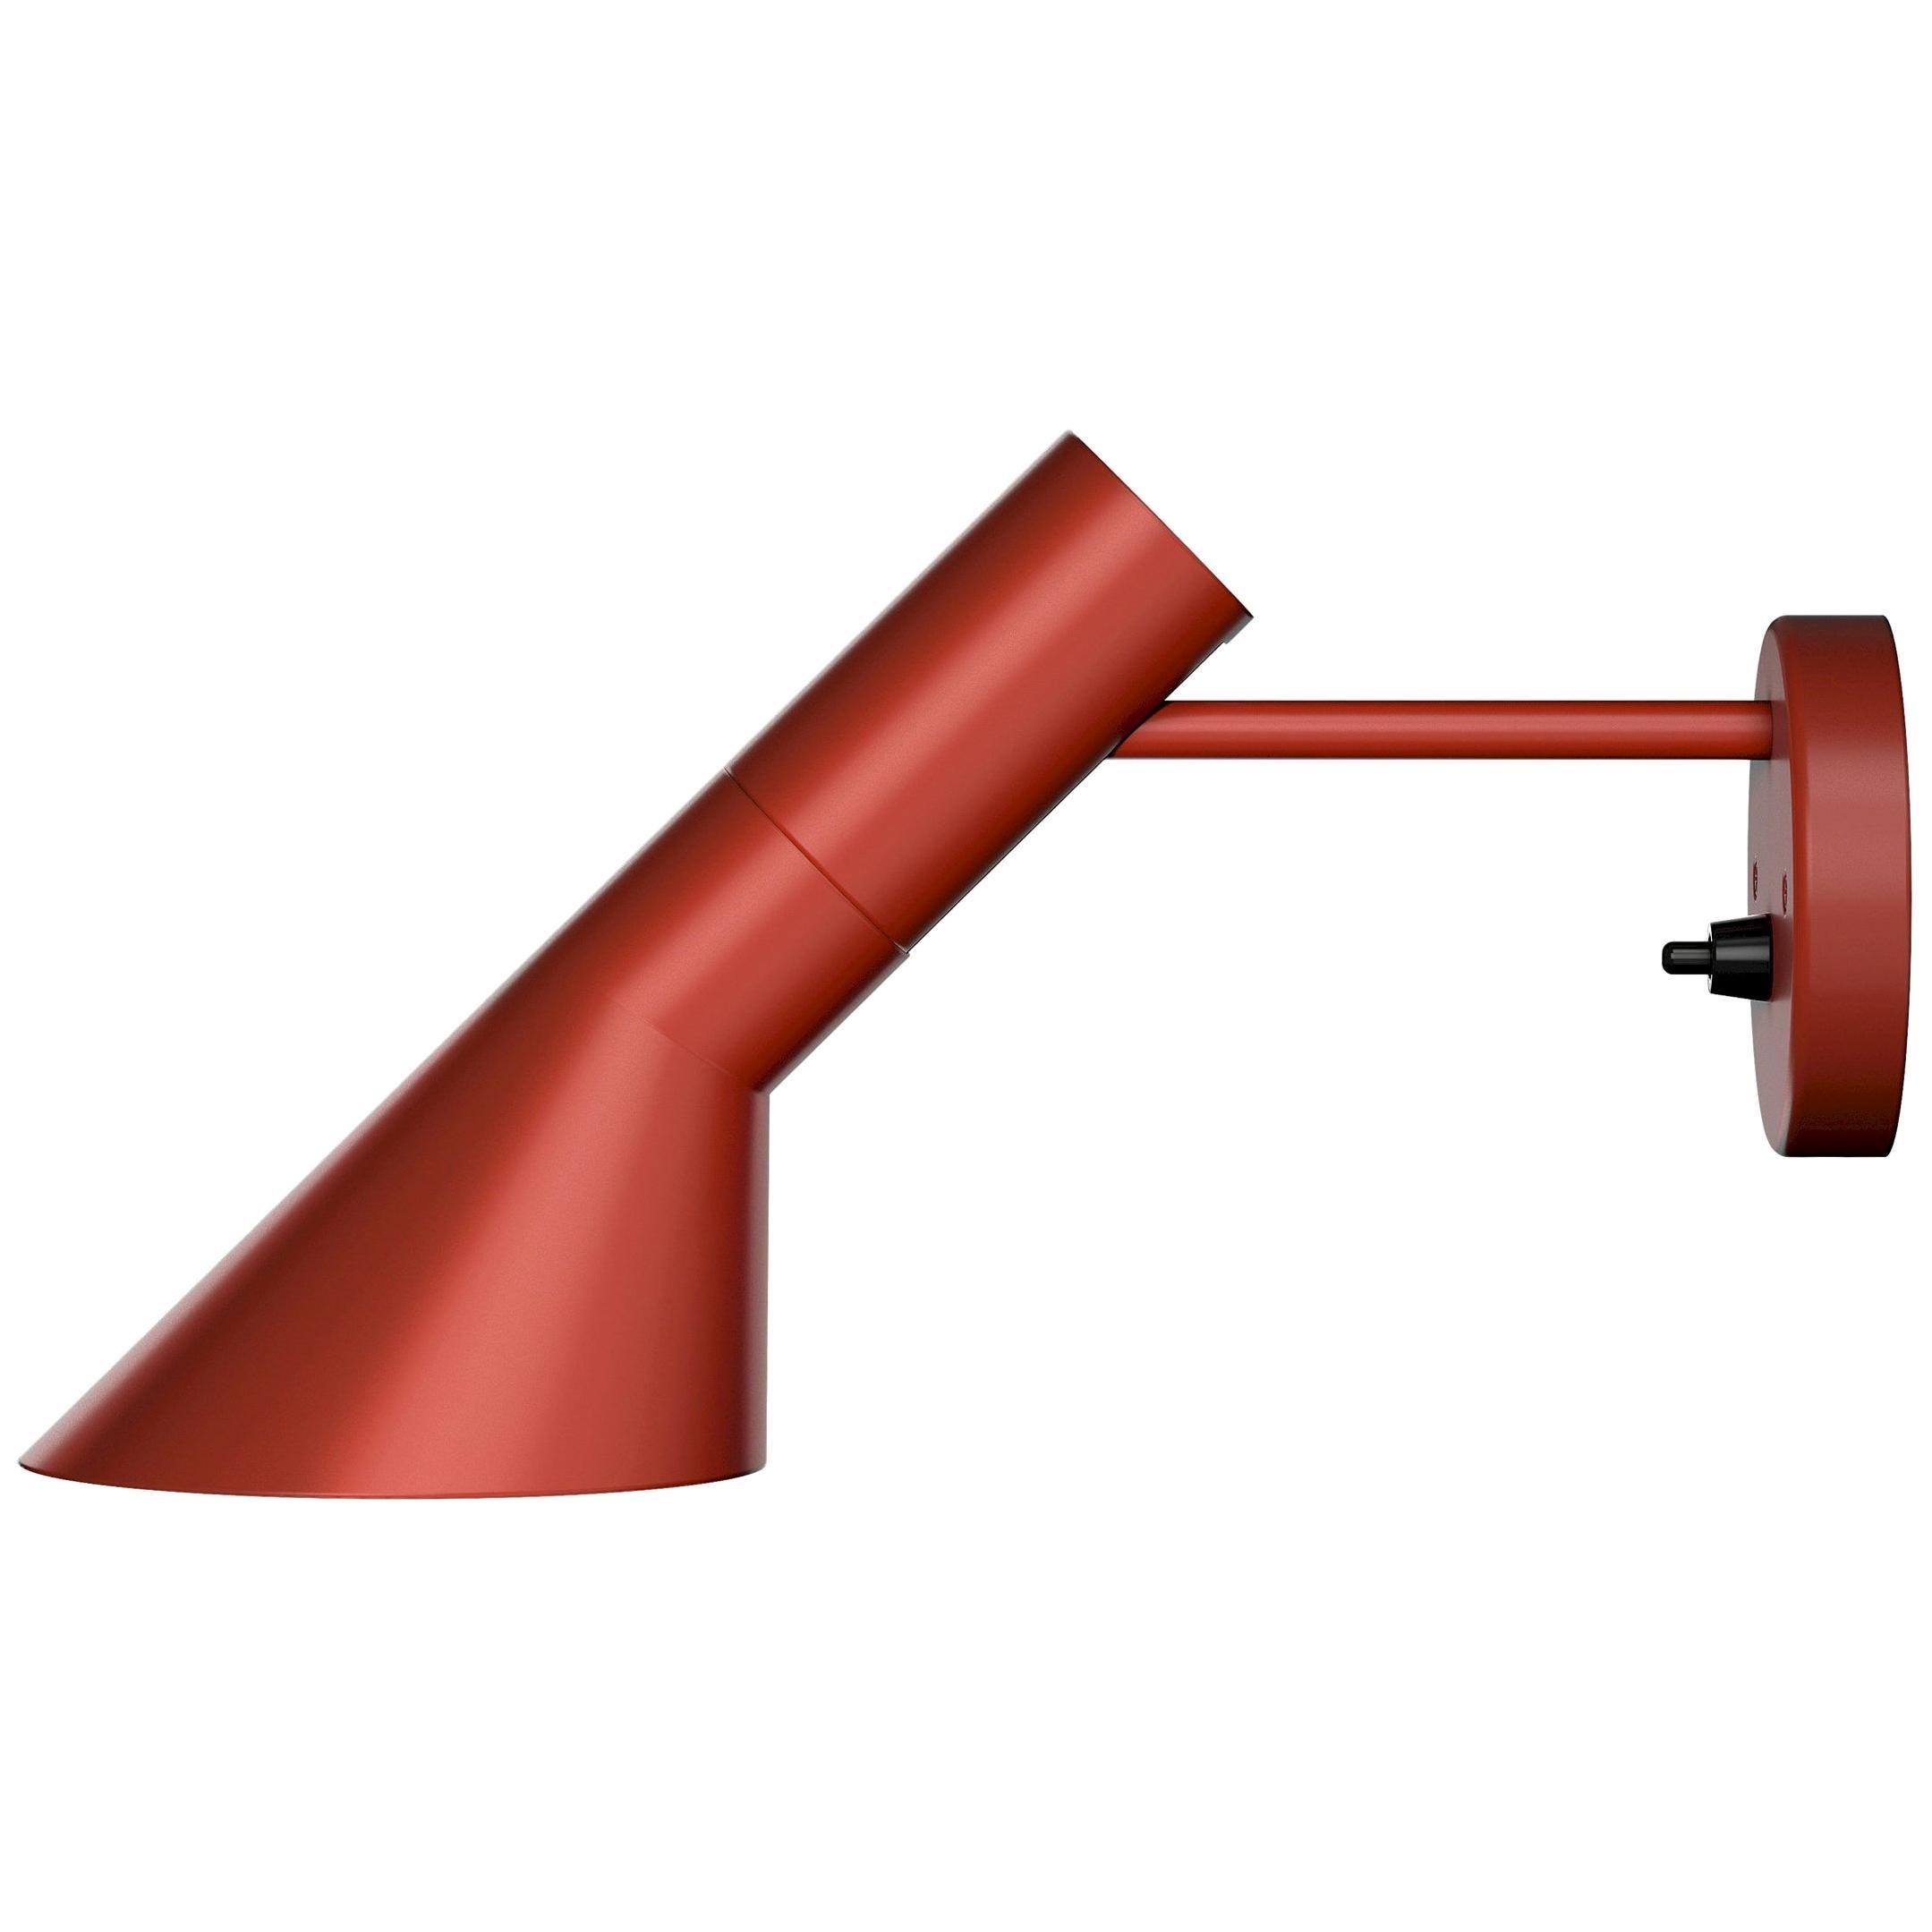 Arne Jacobsen AJ Wall Light for Louis Poulsen in Red